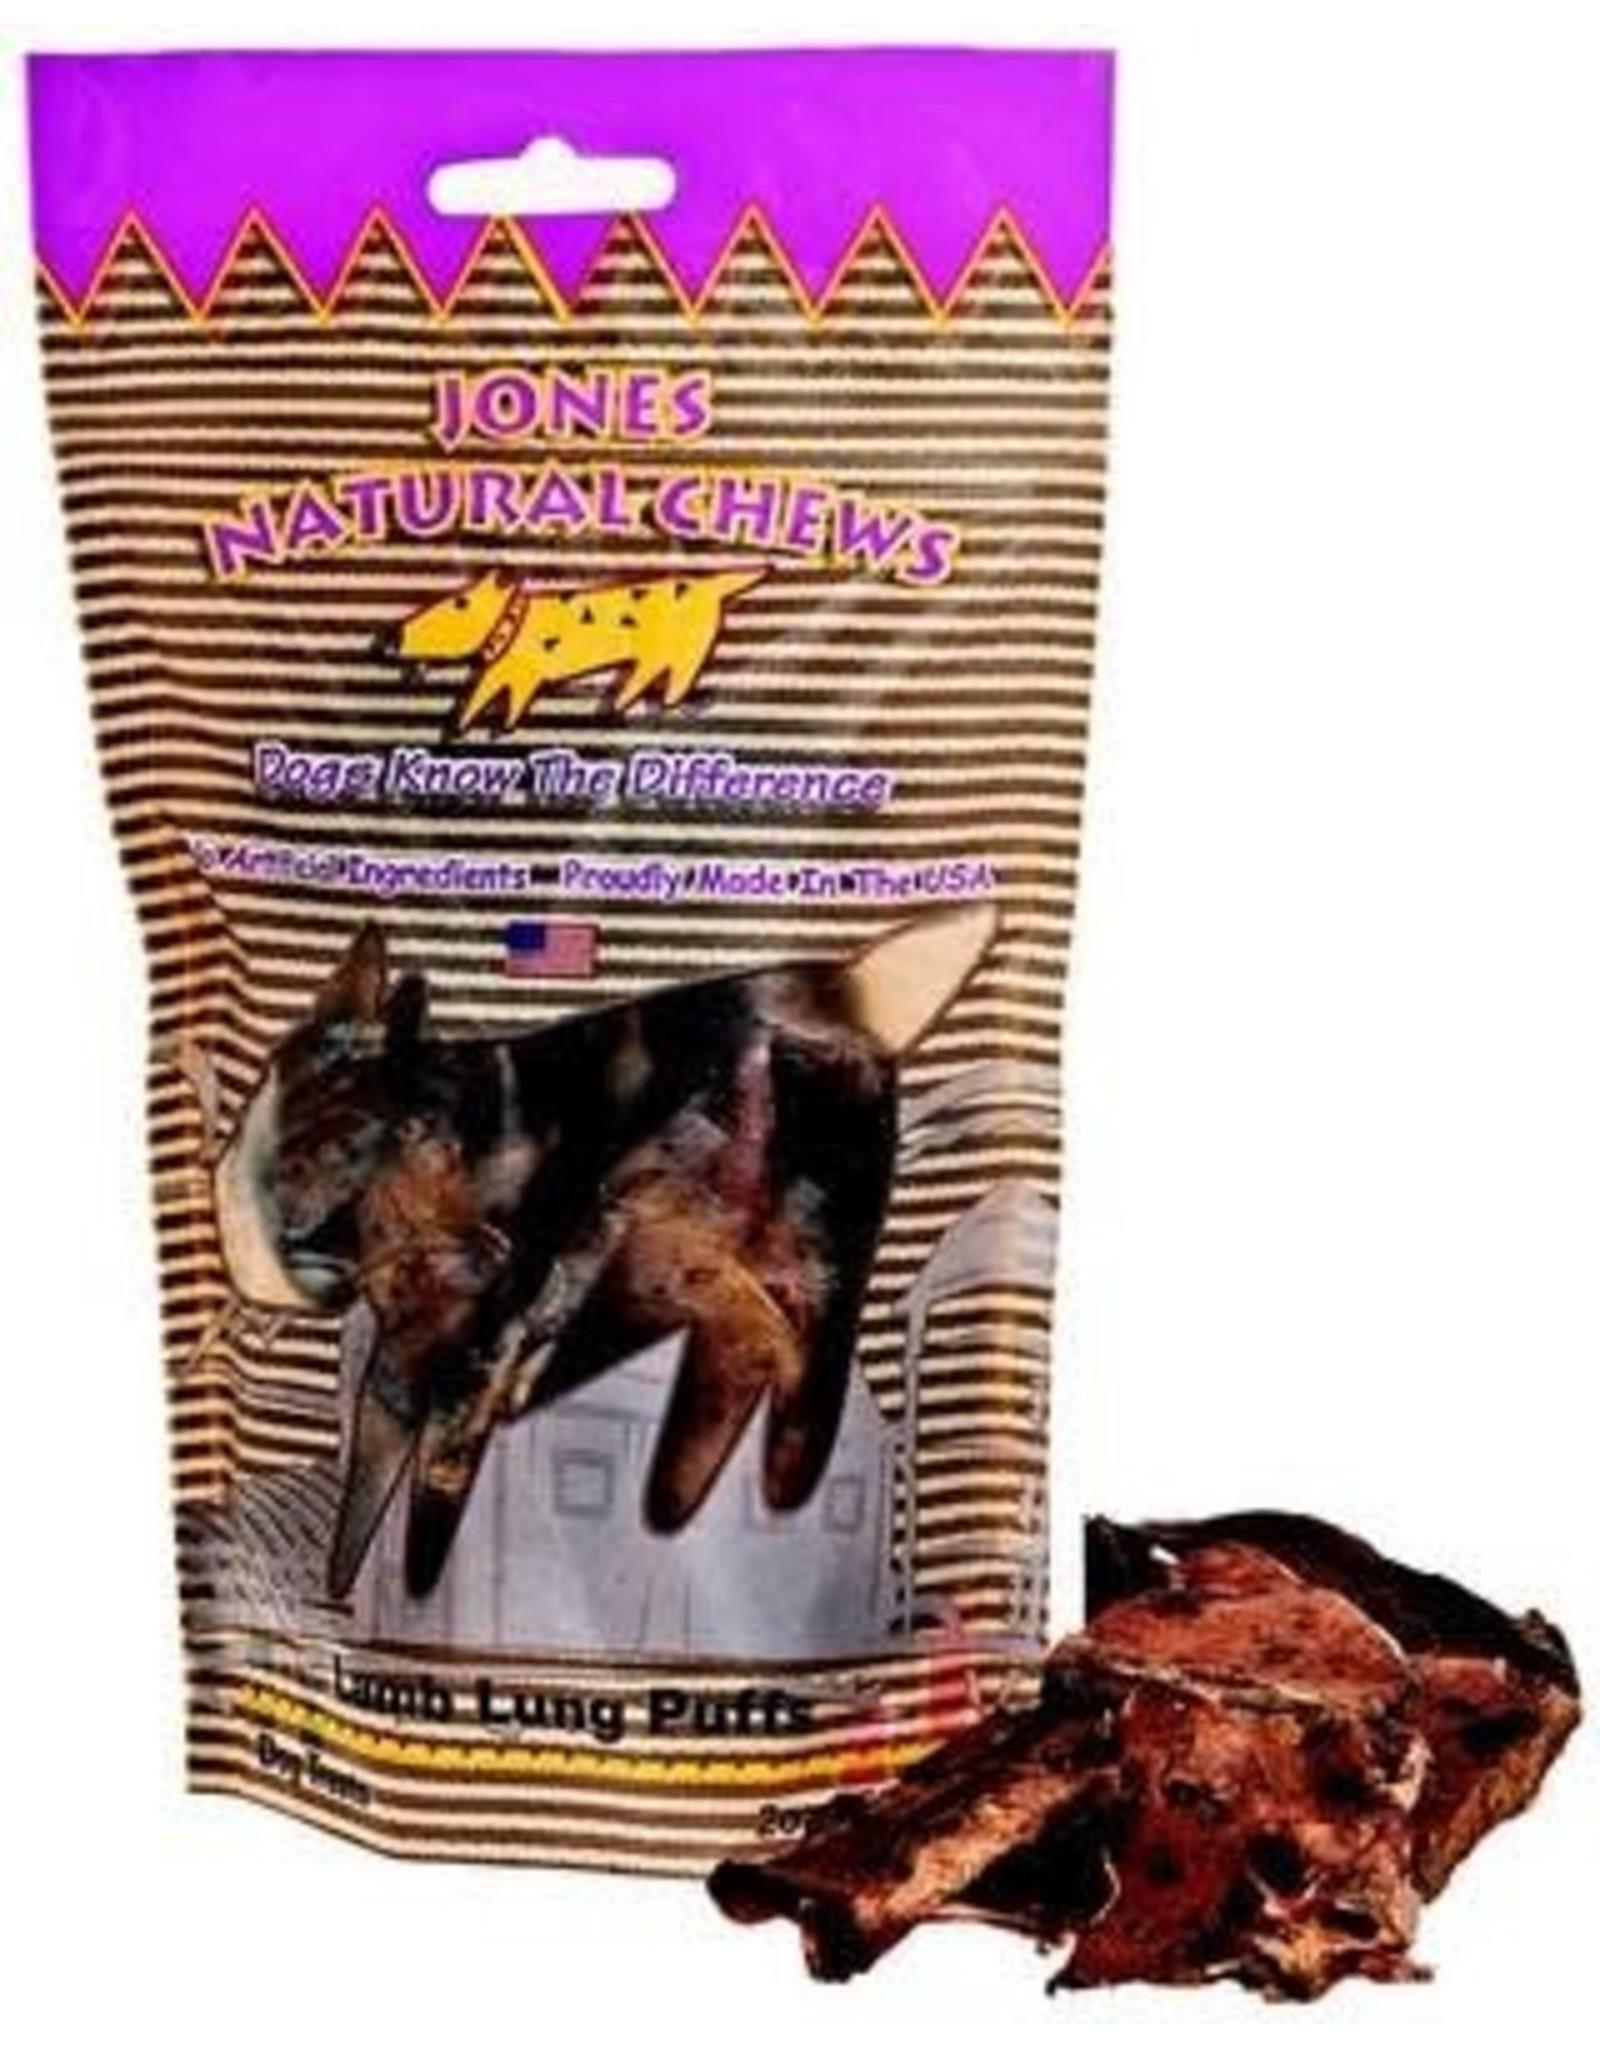 Jones Natural Chews JONES Lamb Lung Puffs 2oz